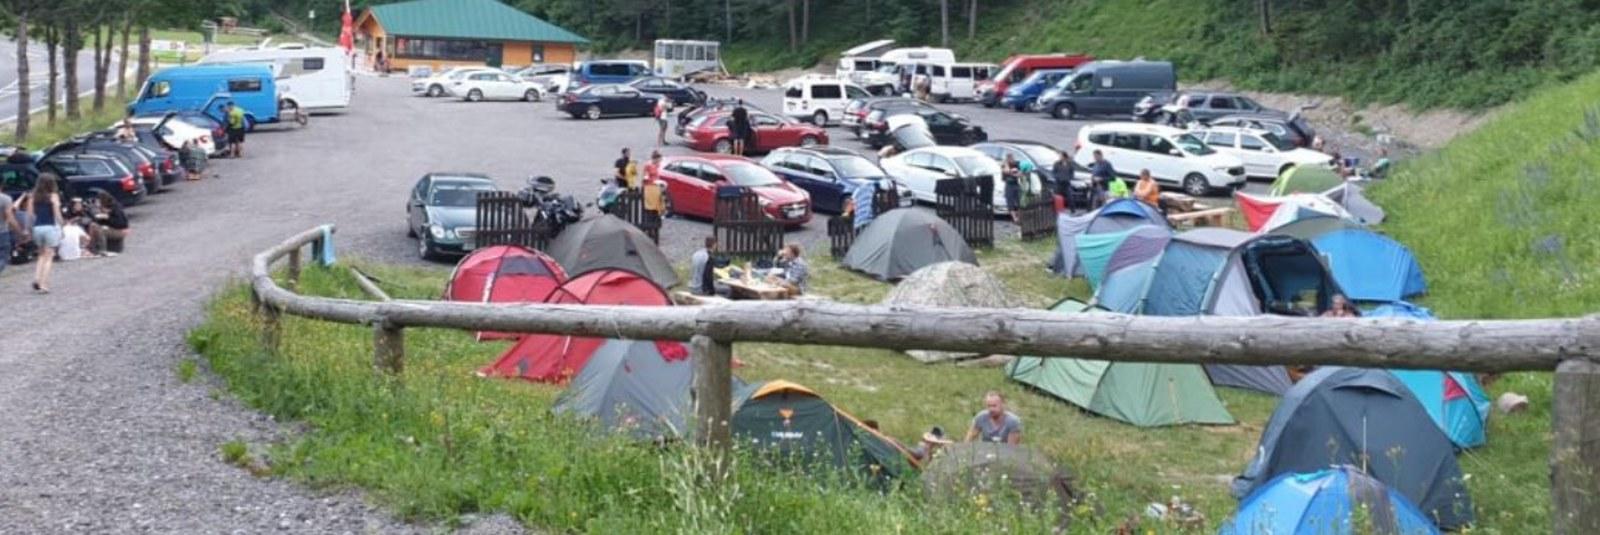 https://www.kempy-chaty.cz/sites/default/files/turistika/rax_park_camping_karavany_1600x535.jpg